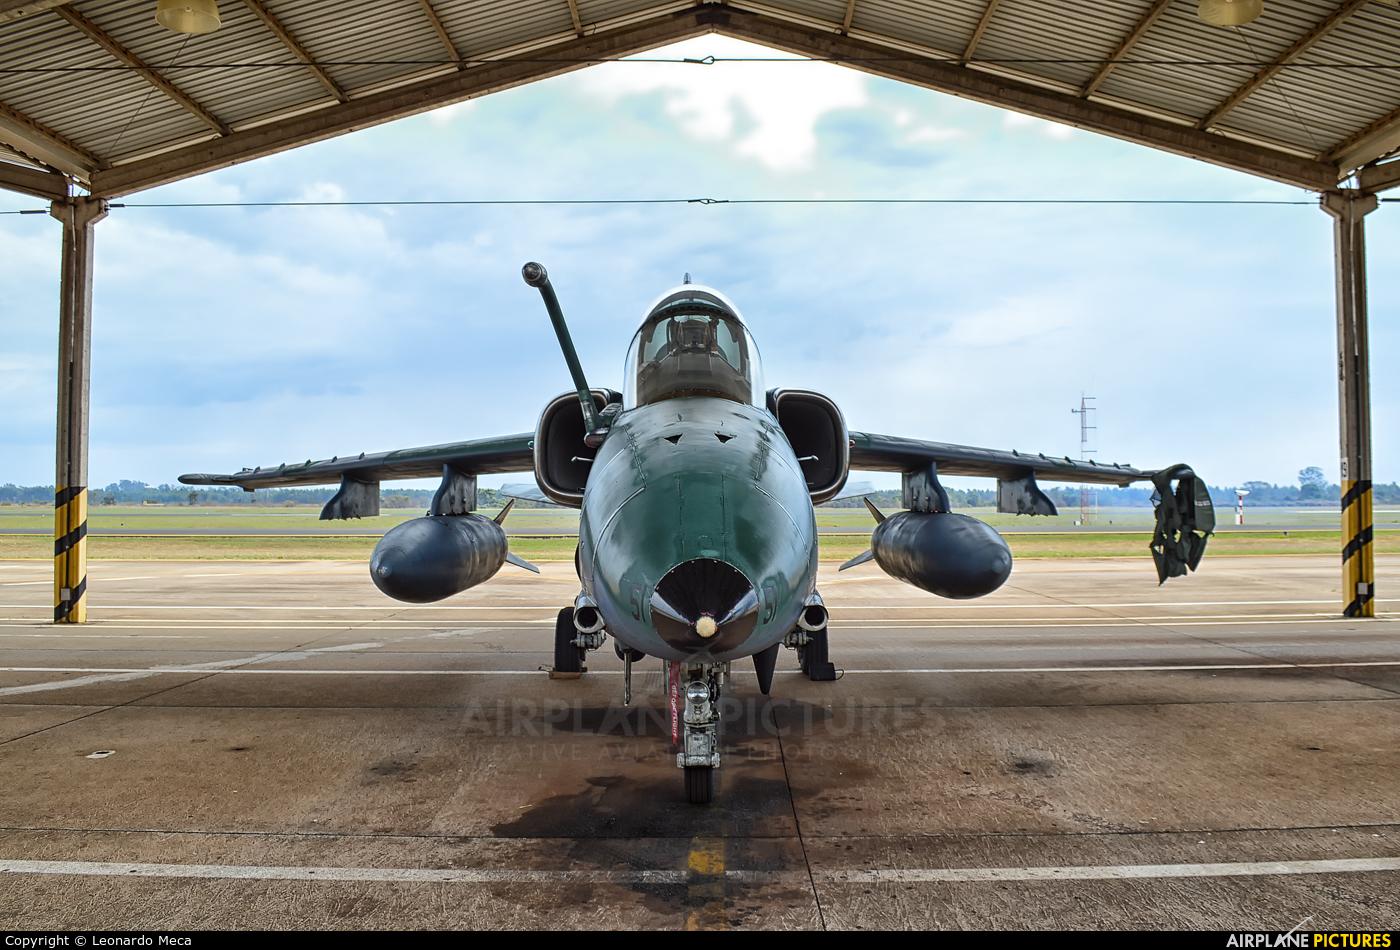 Brazil - Air Force 5561 aircraft at Pirassununga (Campo Fontenelle)